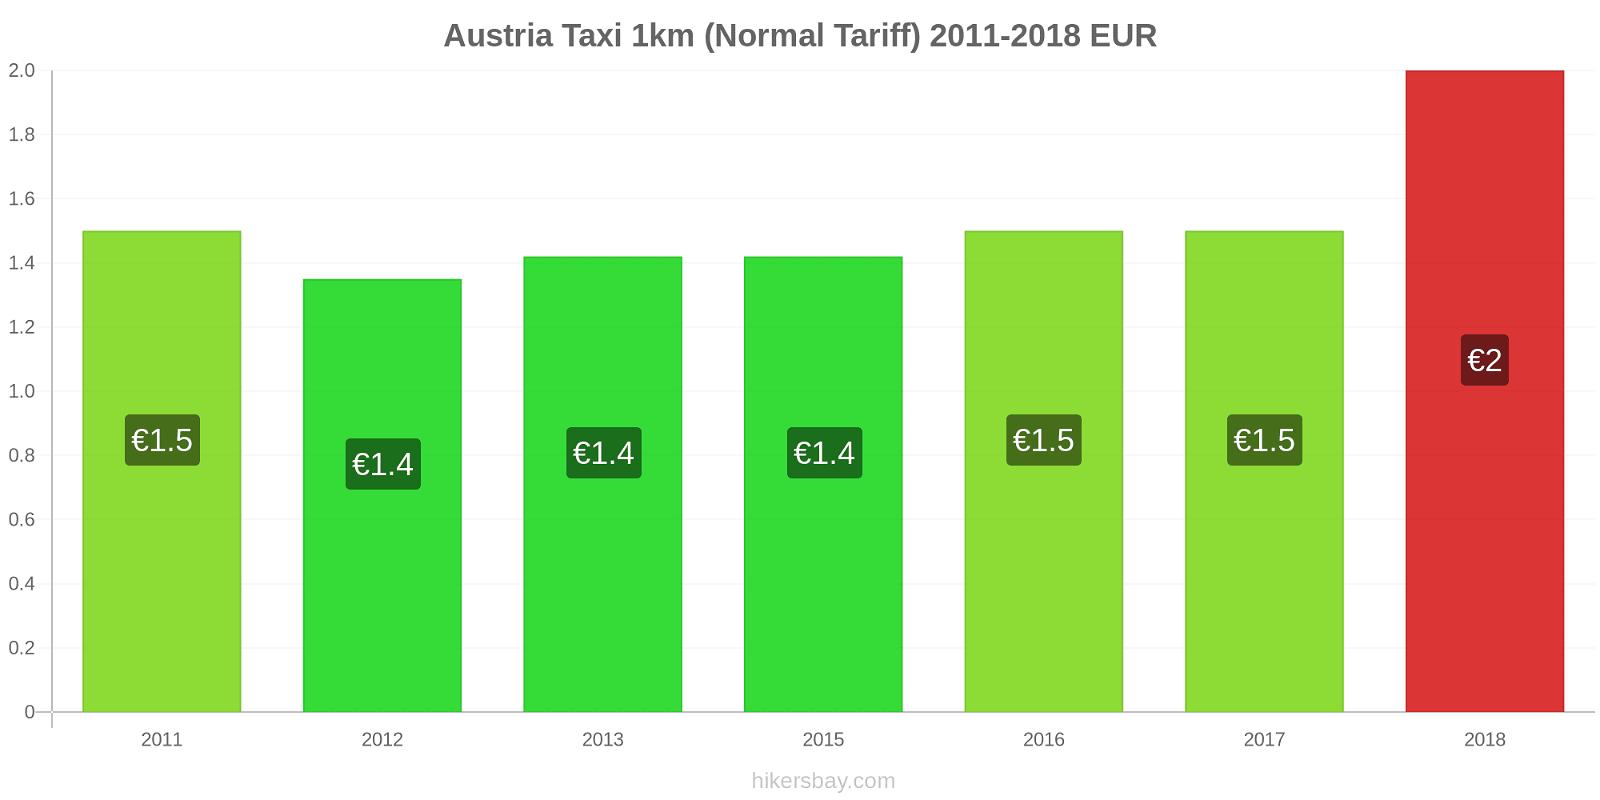 Austria price changes Taxi 1km (Normal Tariff) hikersbay.com